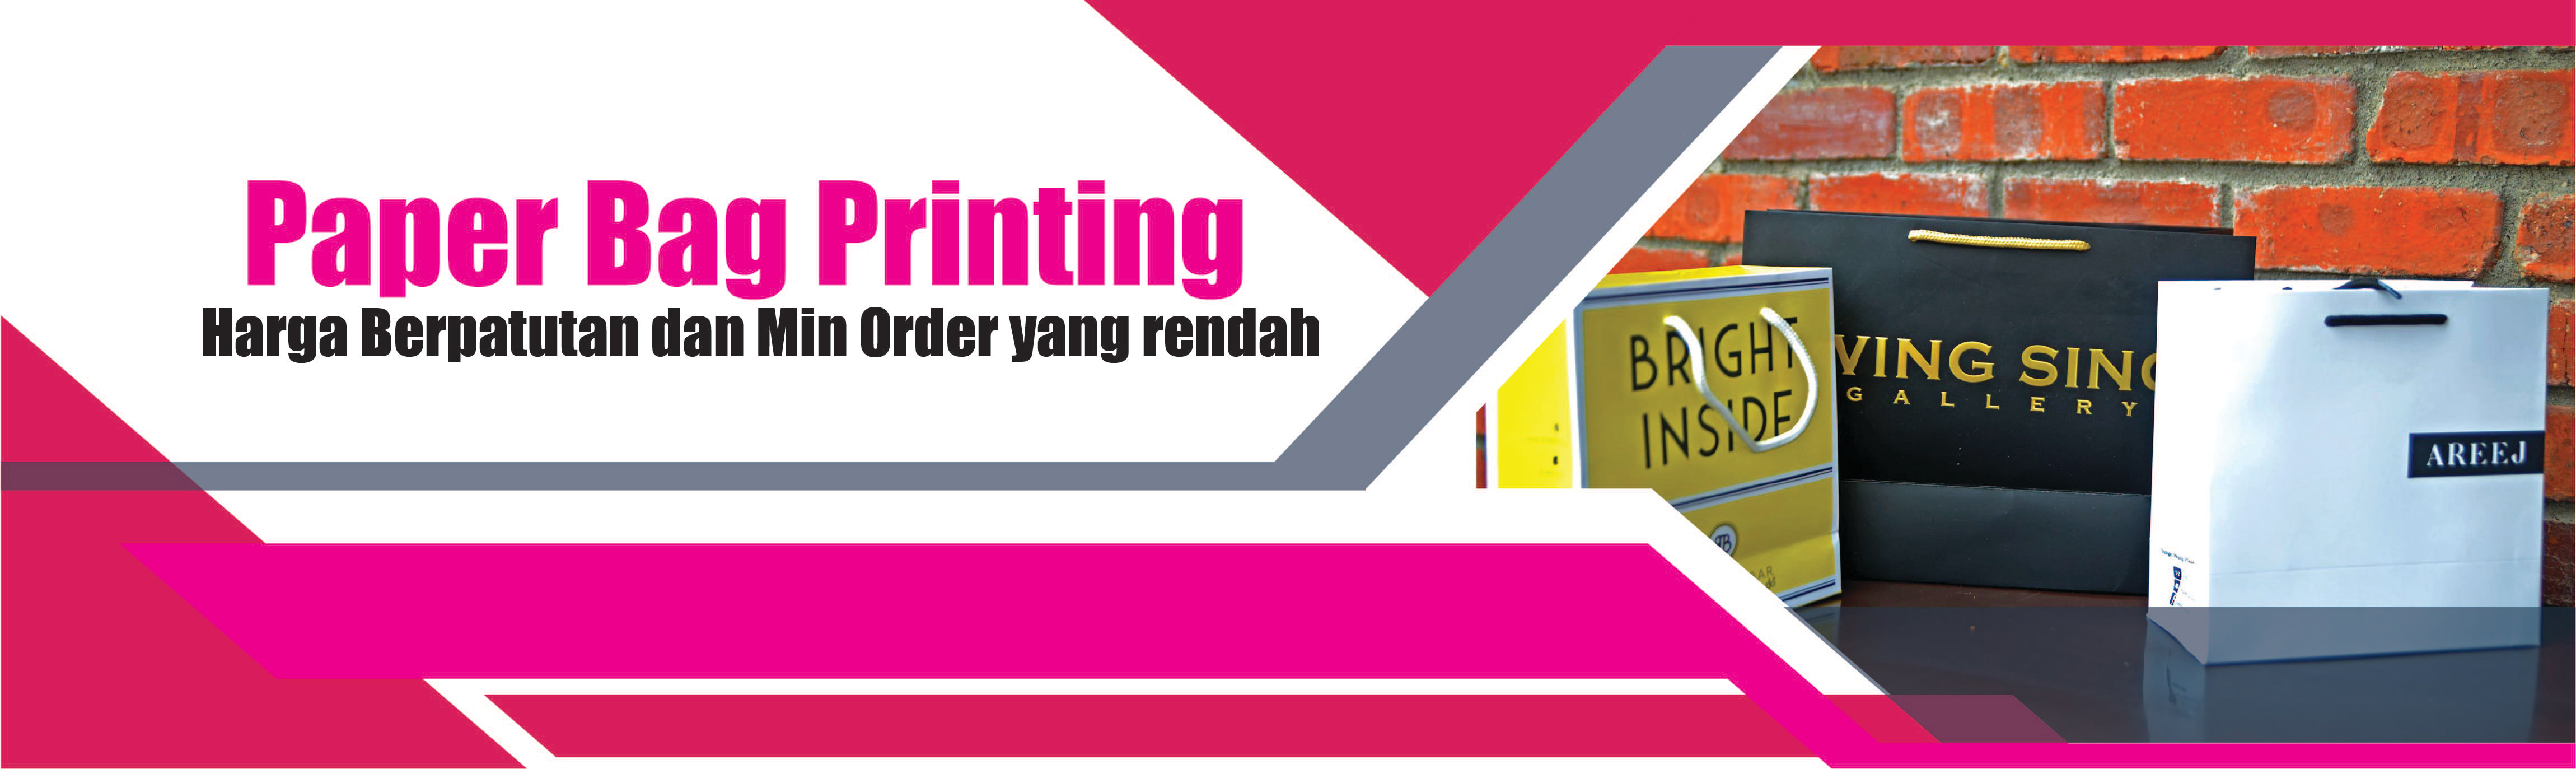 paper beg printing-01-01